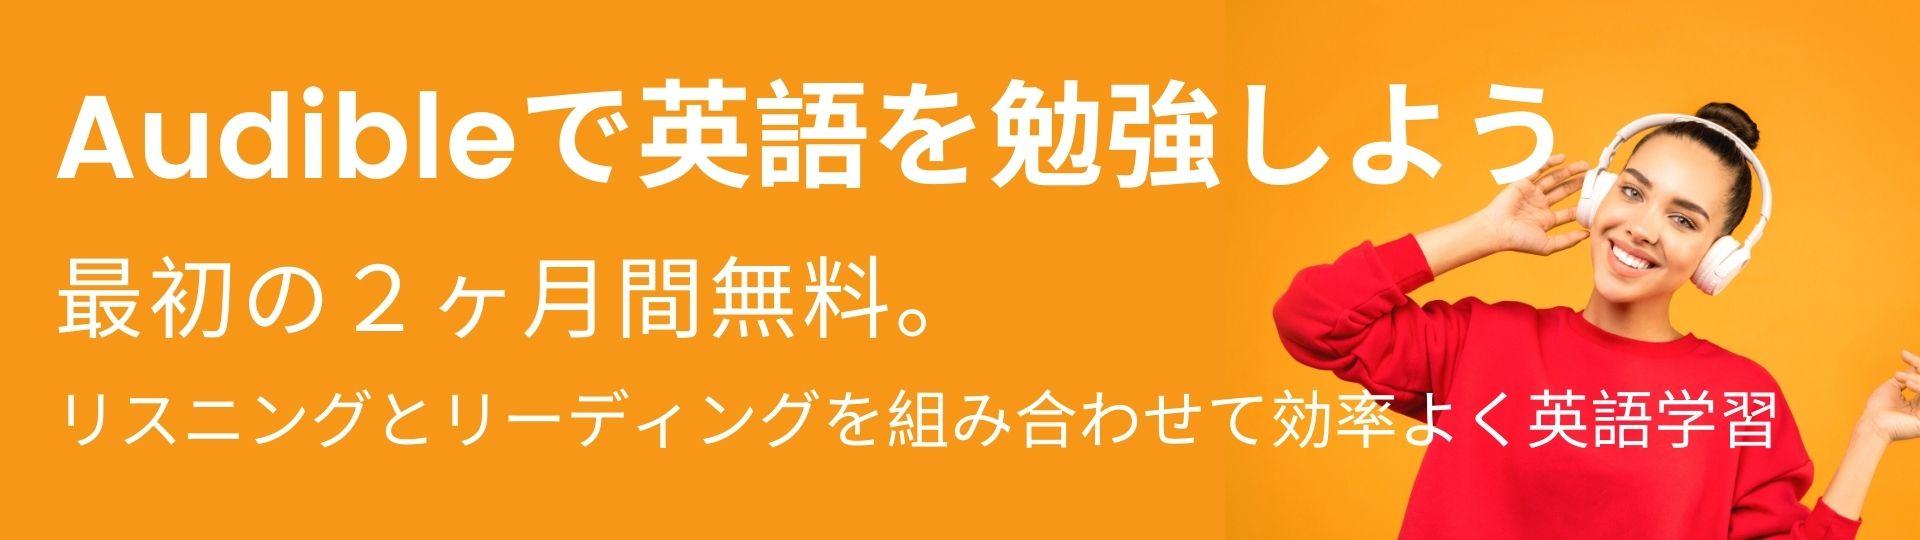 Audibleで英語を勉強しよう